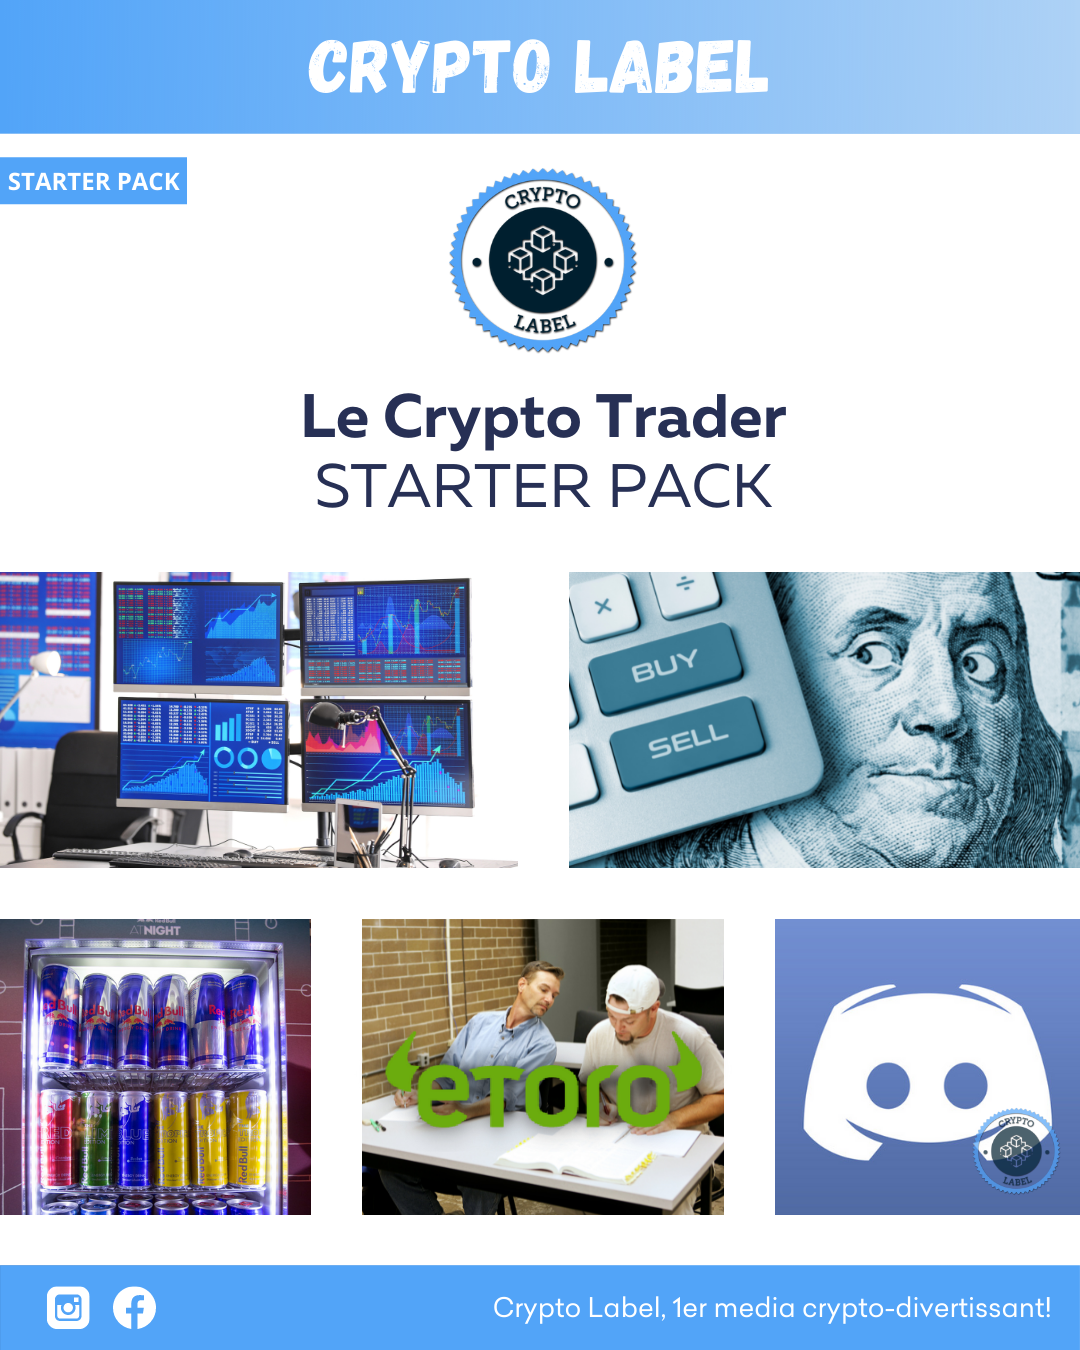 CRYPTO TRADER - Crypto Label STARTER PACK